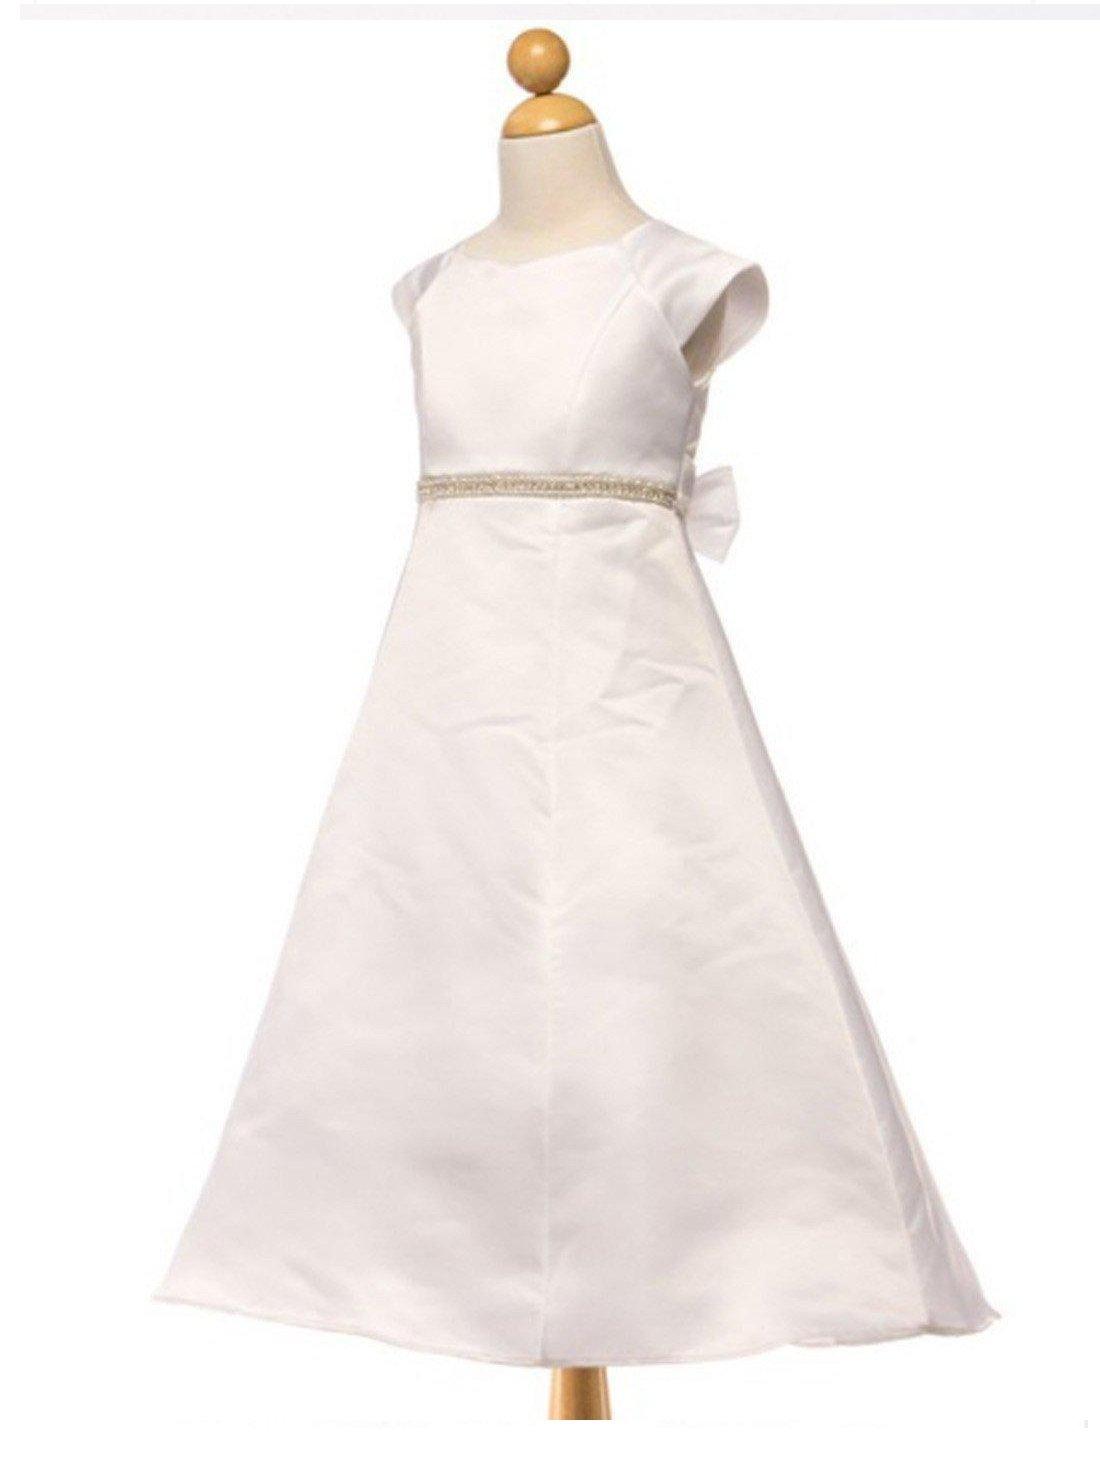 Flower Girl Dress Satin A Line Dress with Beaded Waist belt Party Dress Special Occasion Dress